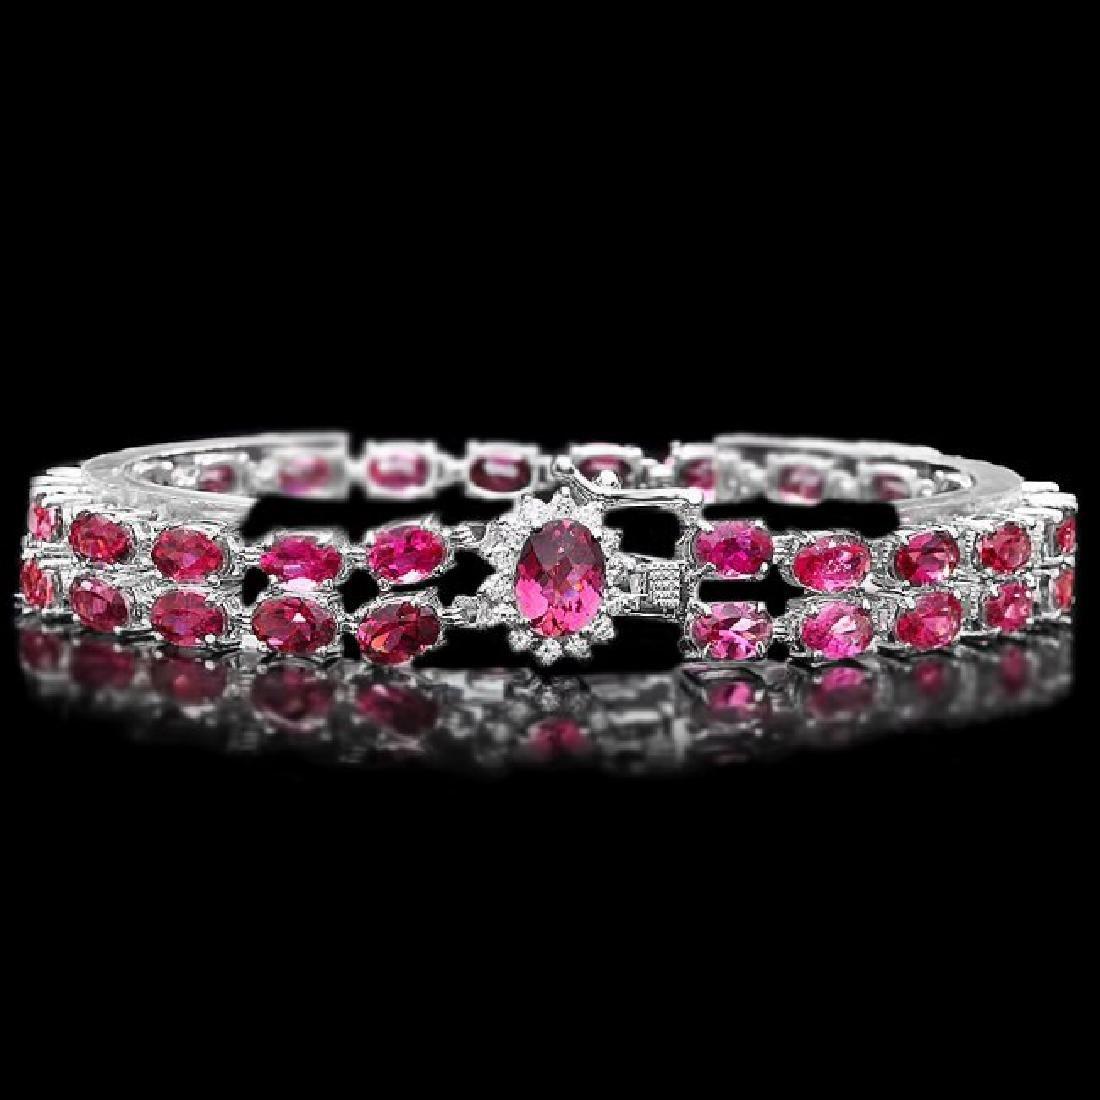 14k 21.2ct Tourmaline 0.40ct Diamond Bracelet